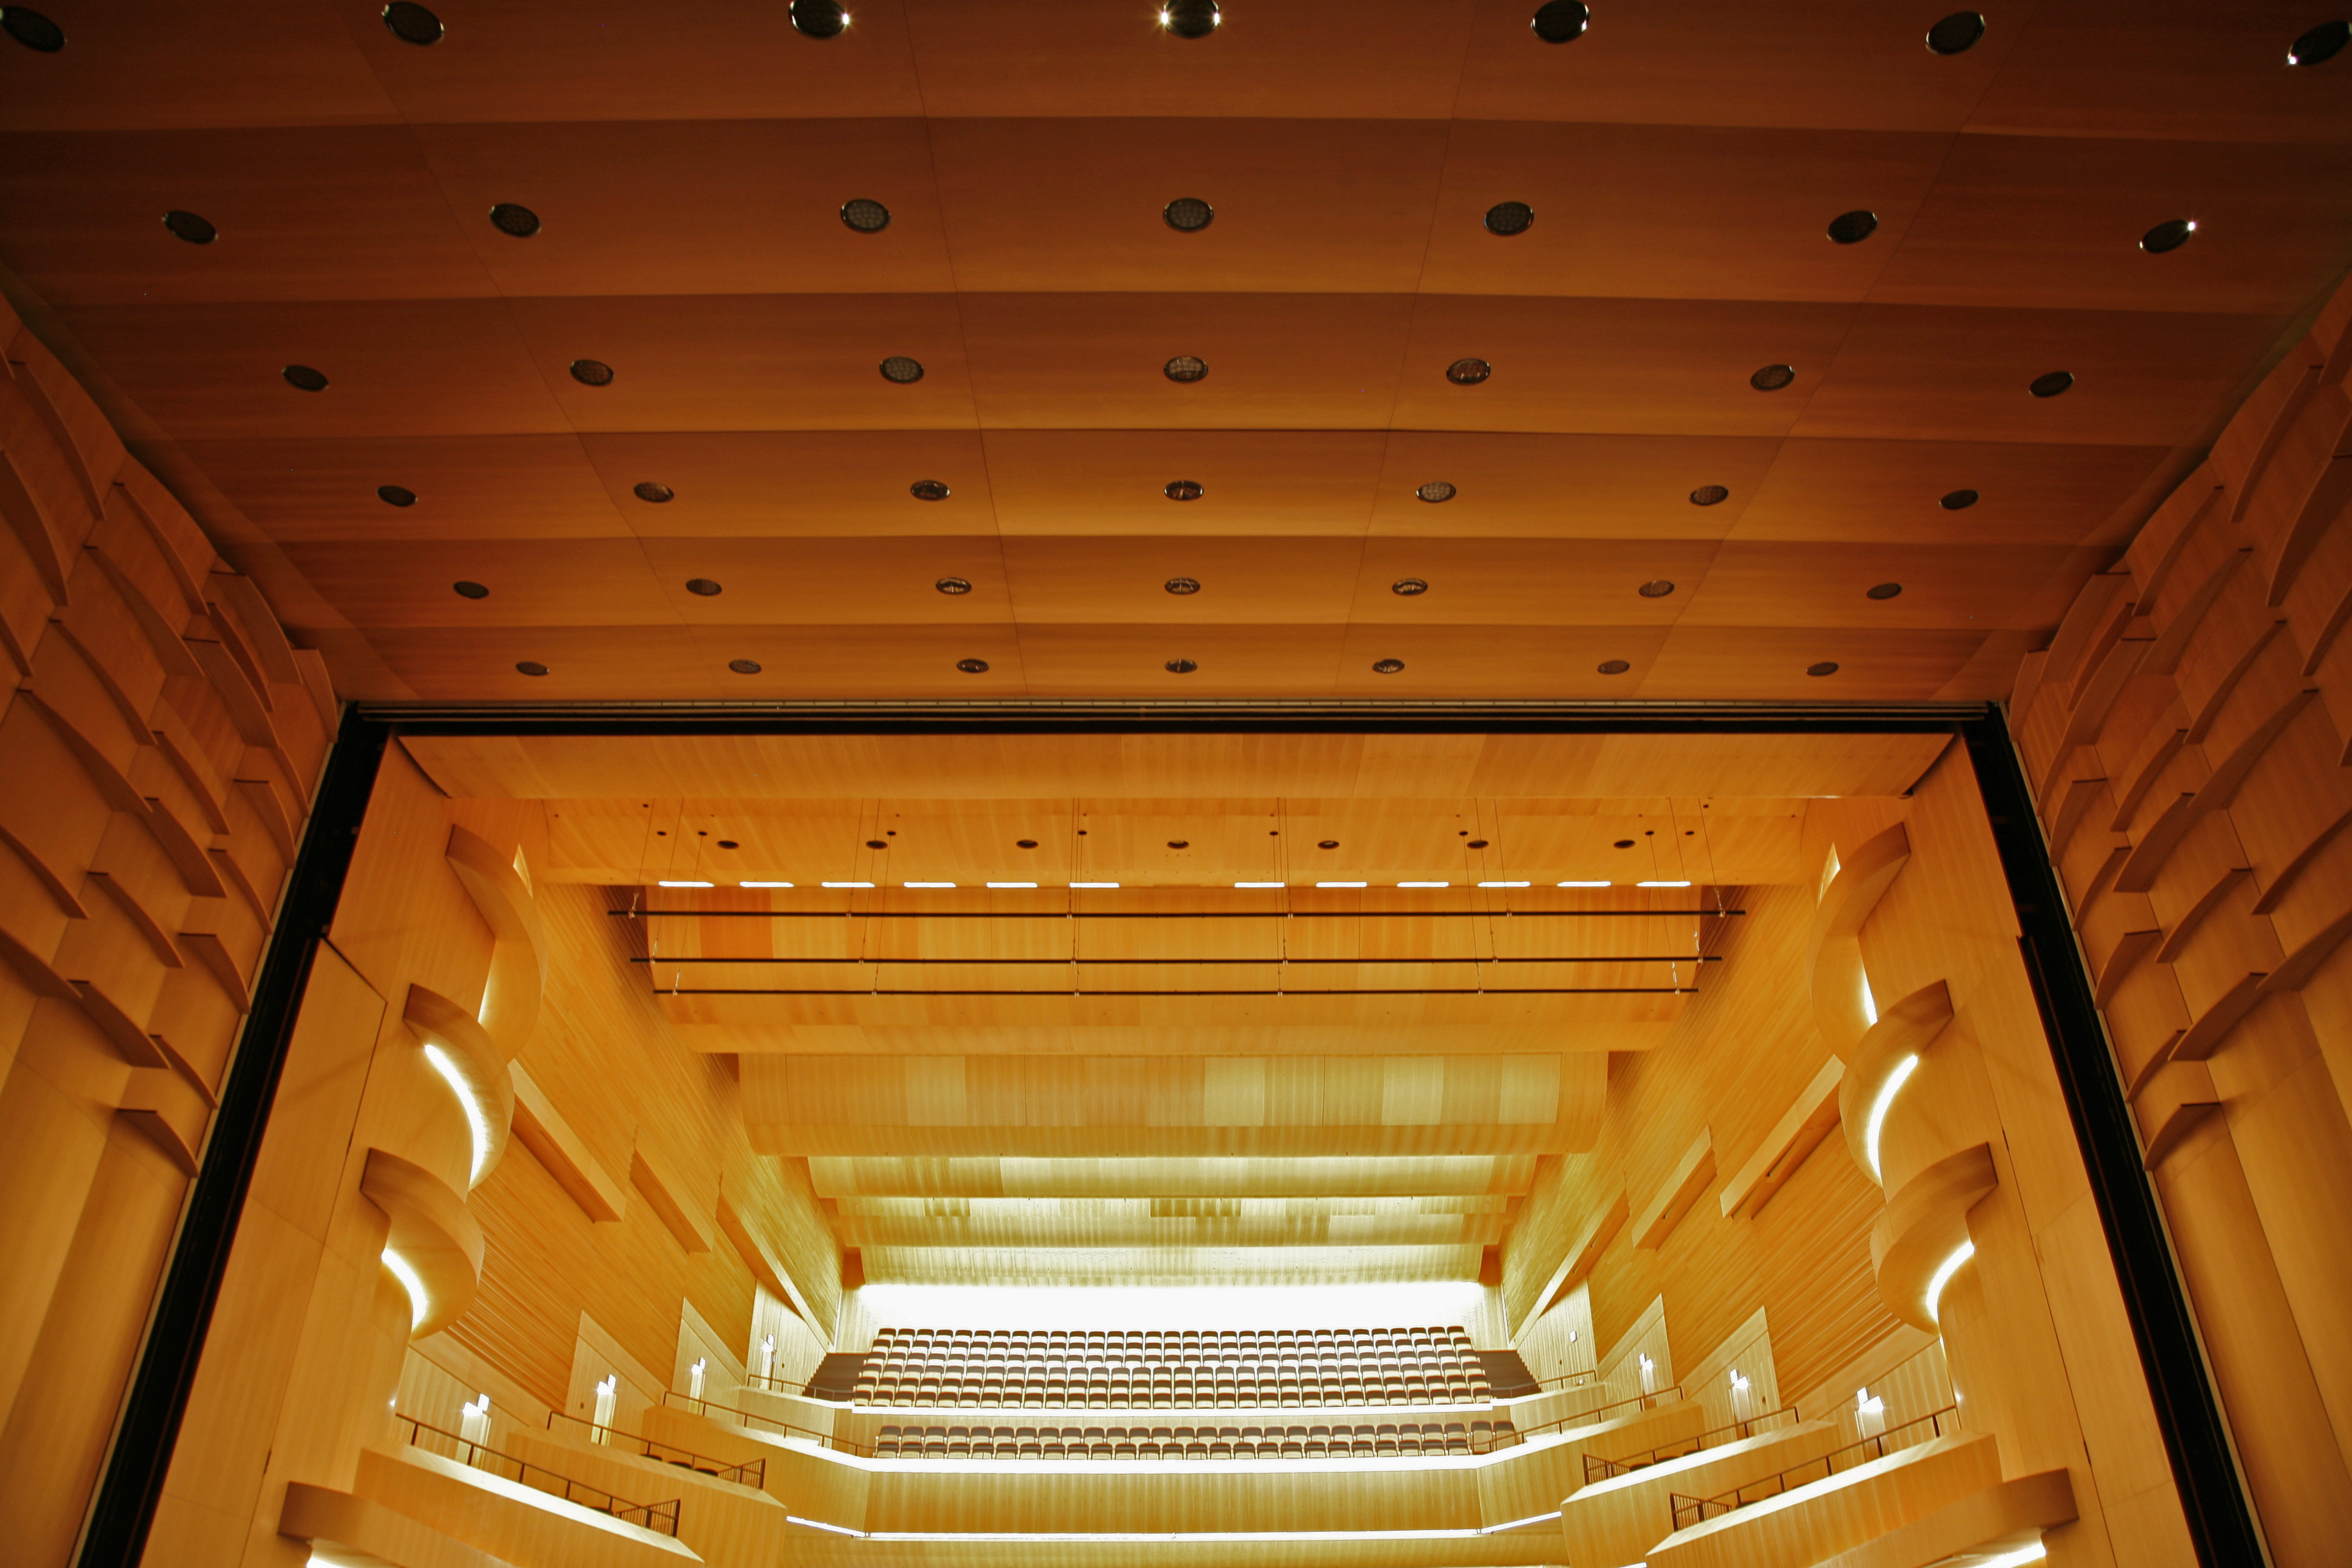 Architectural Acoustic